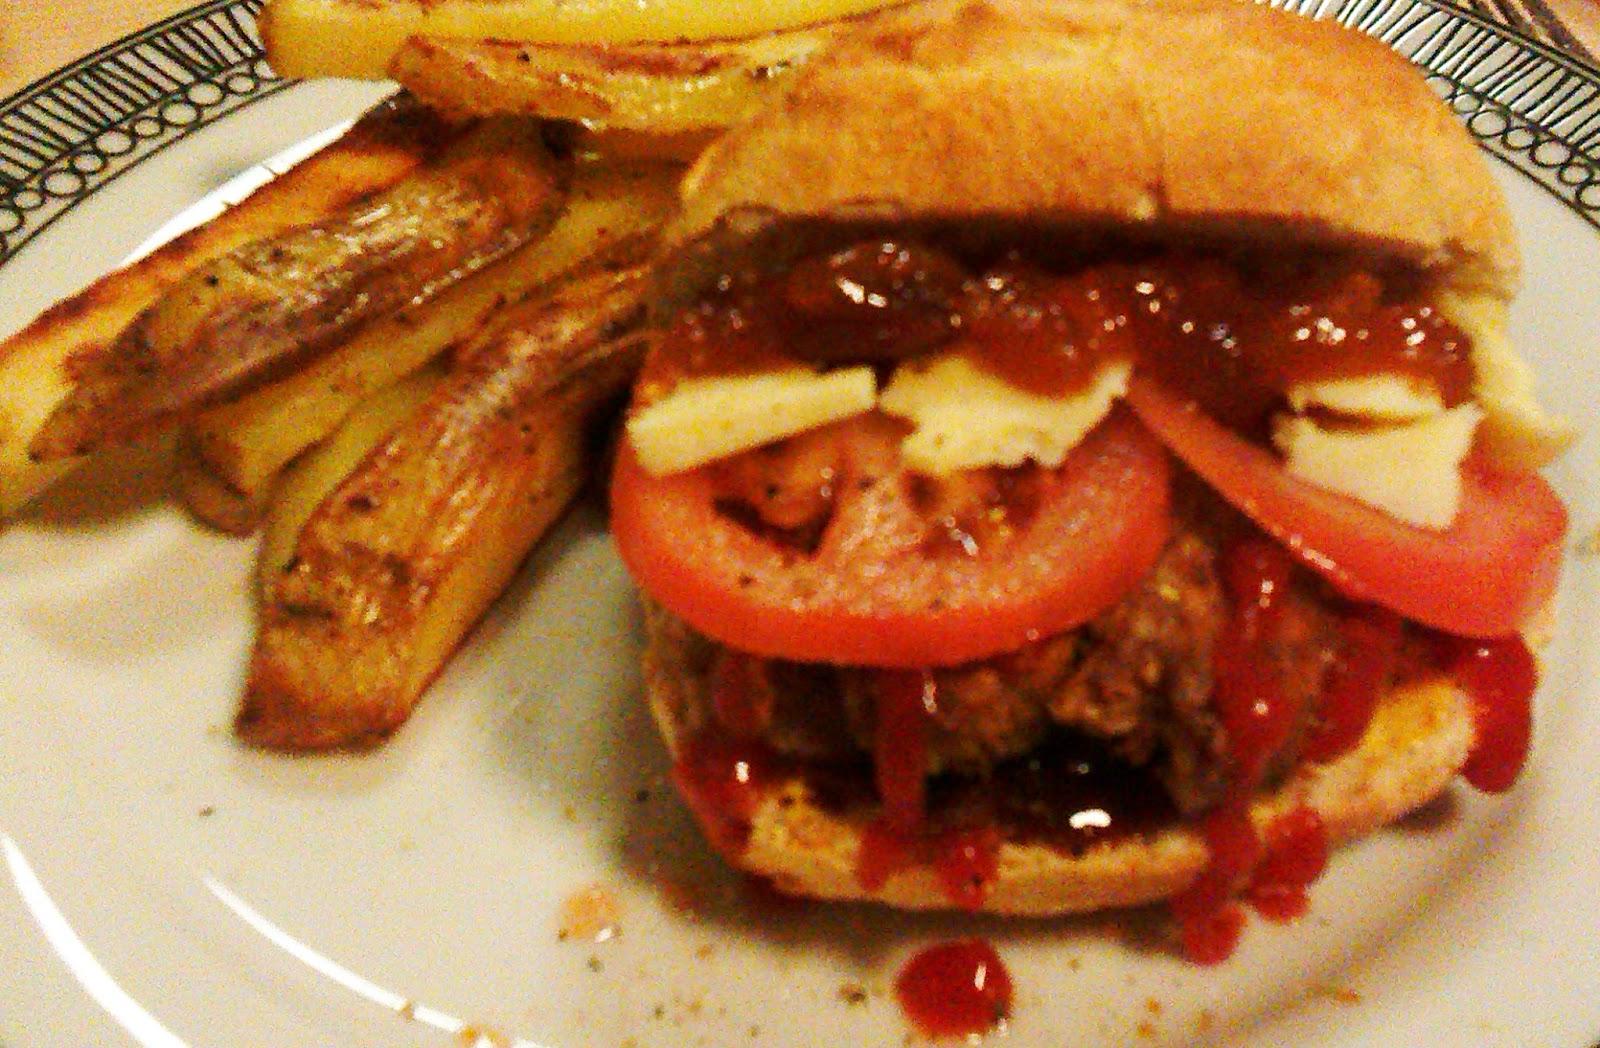 Massive Food Baby: Burgers (Beef or Sweet Potato) with ...